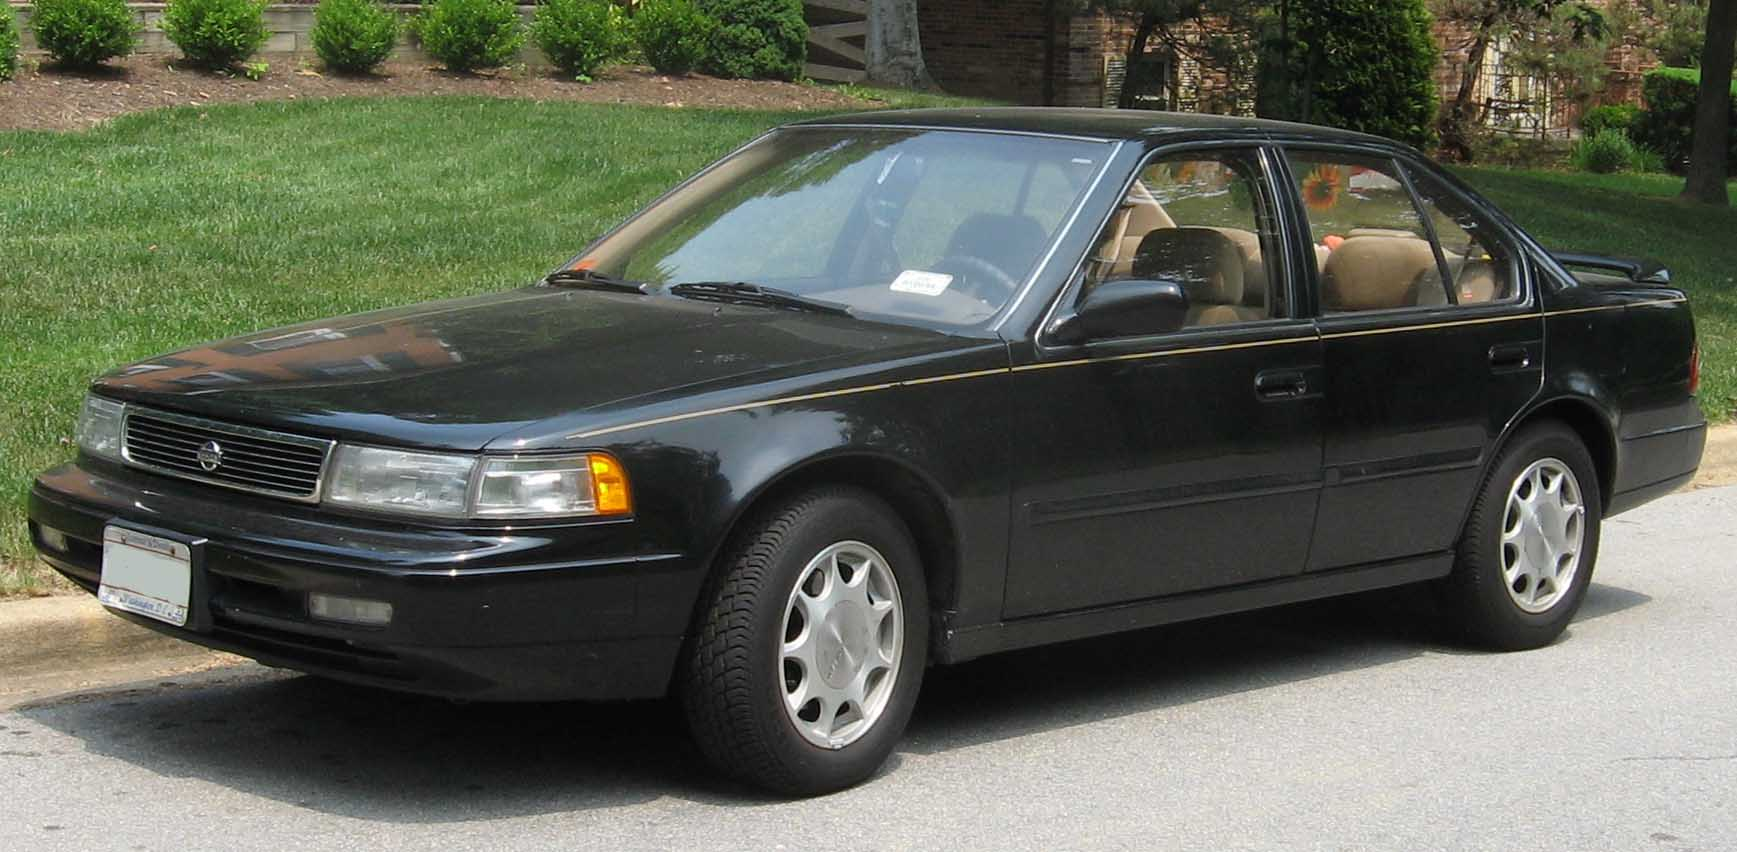 Nissan Maxima Reliability >> 1992 Nissan Maxima Black | 200+ Interior and Exterior Images